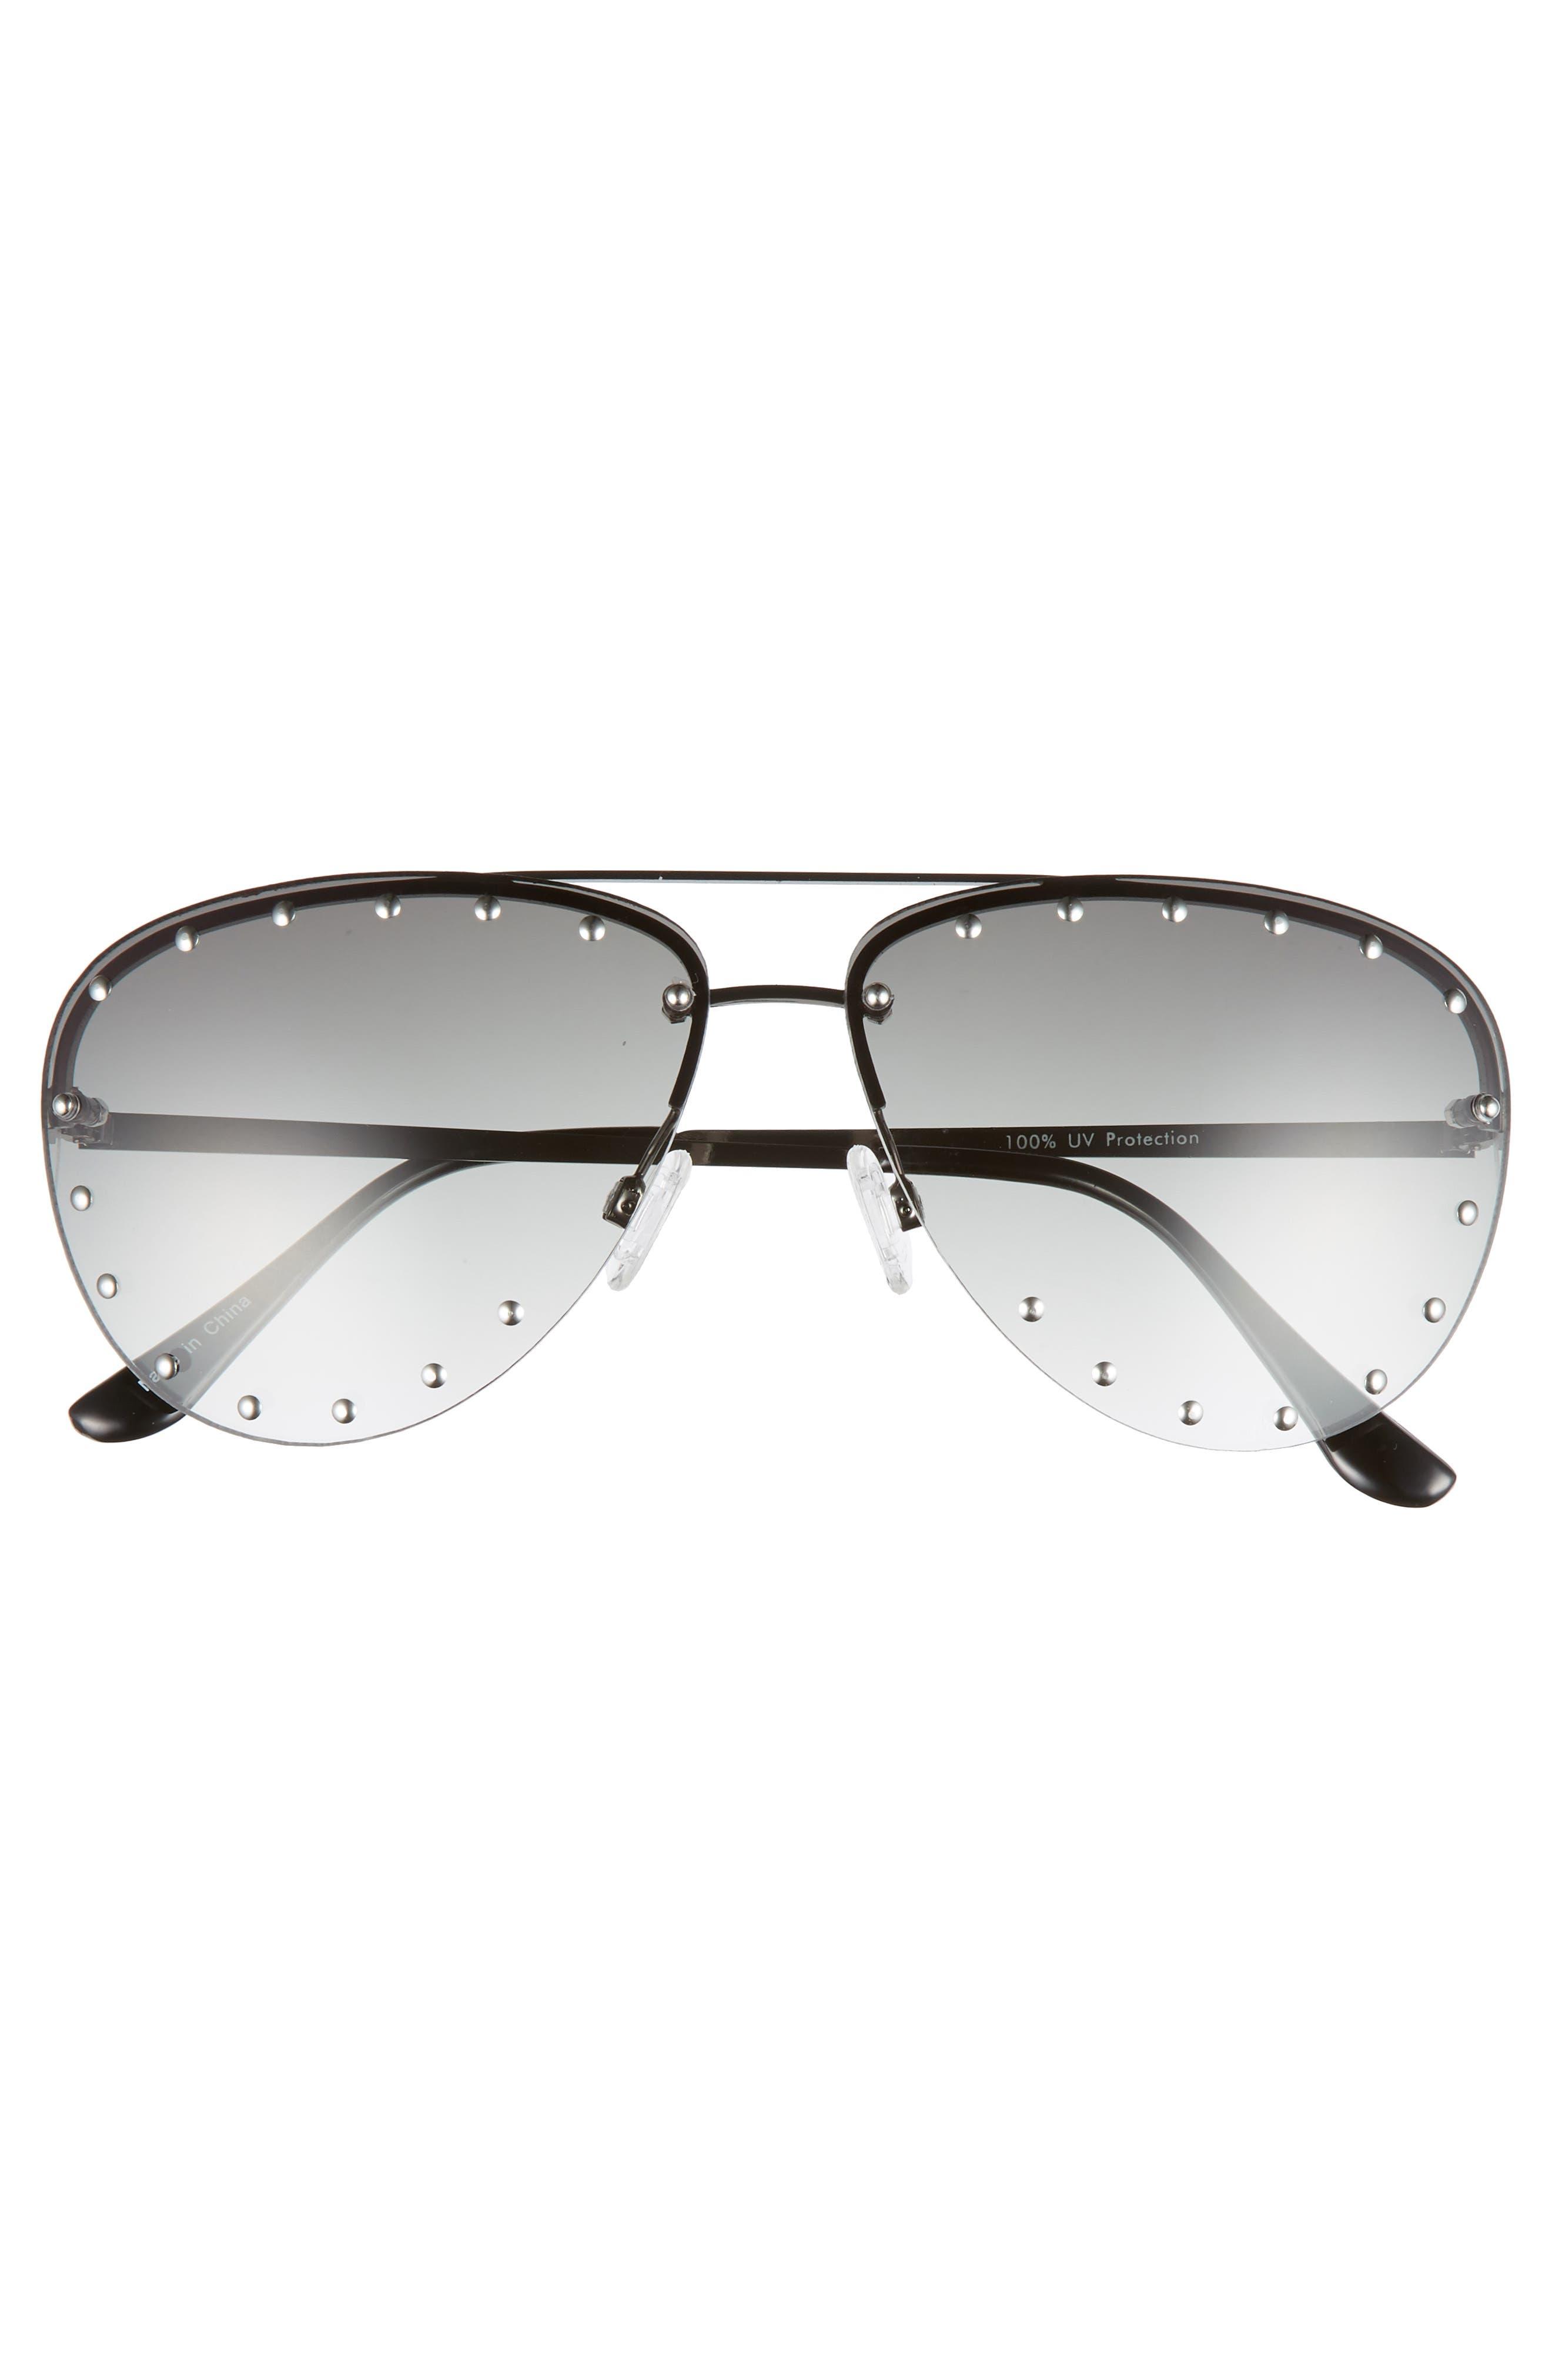 63mm Studded Aviator Sunglasses,                             Alternate thumbnail 3, color,                             Silver/ Green